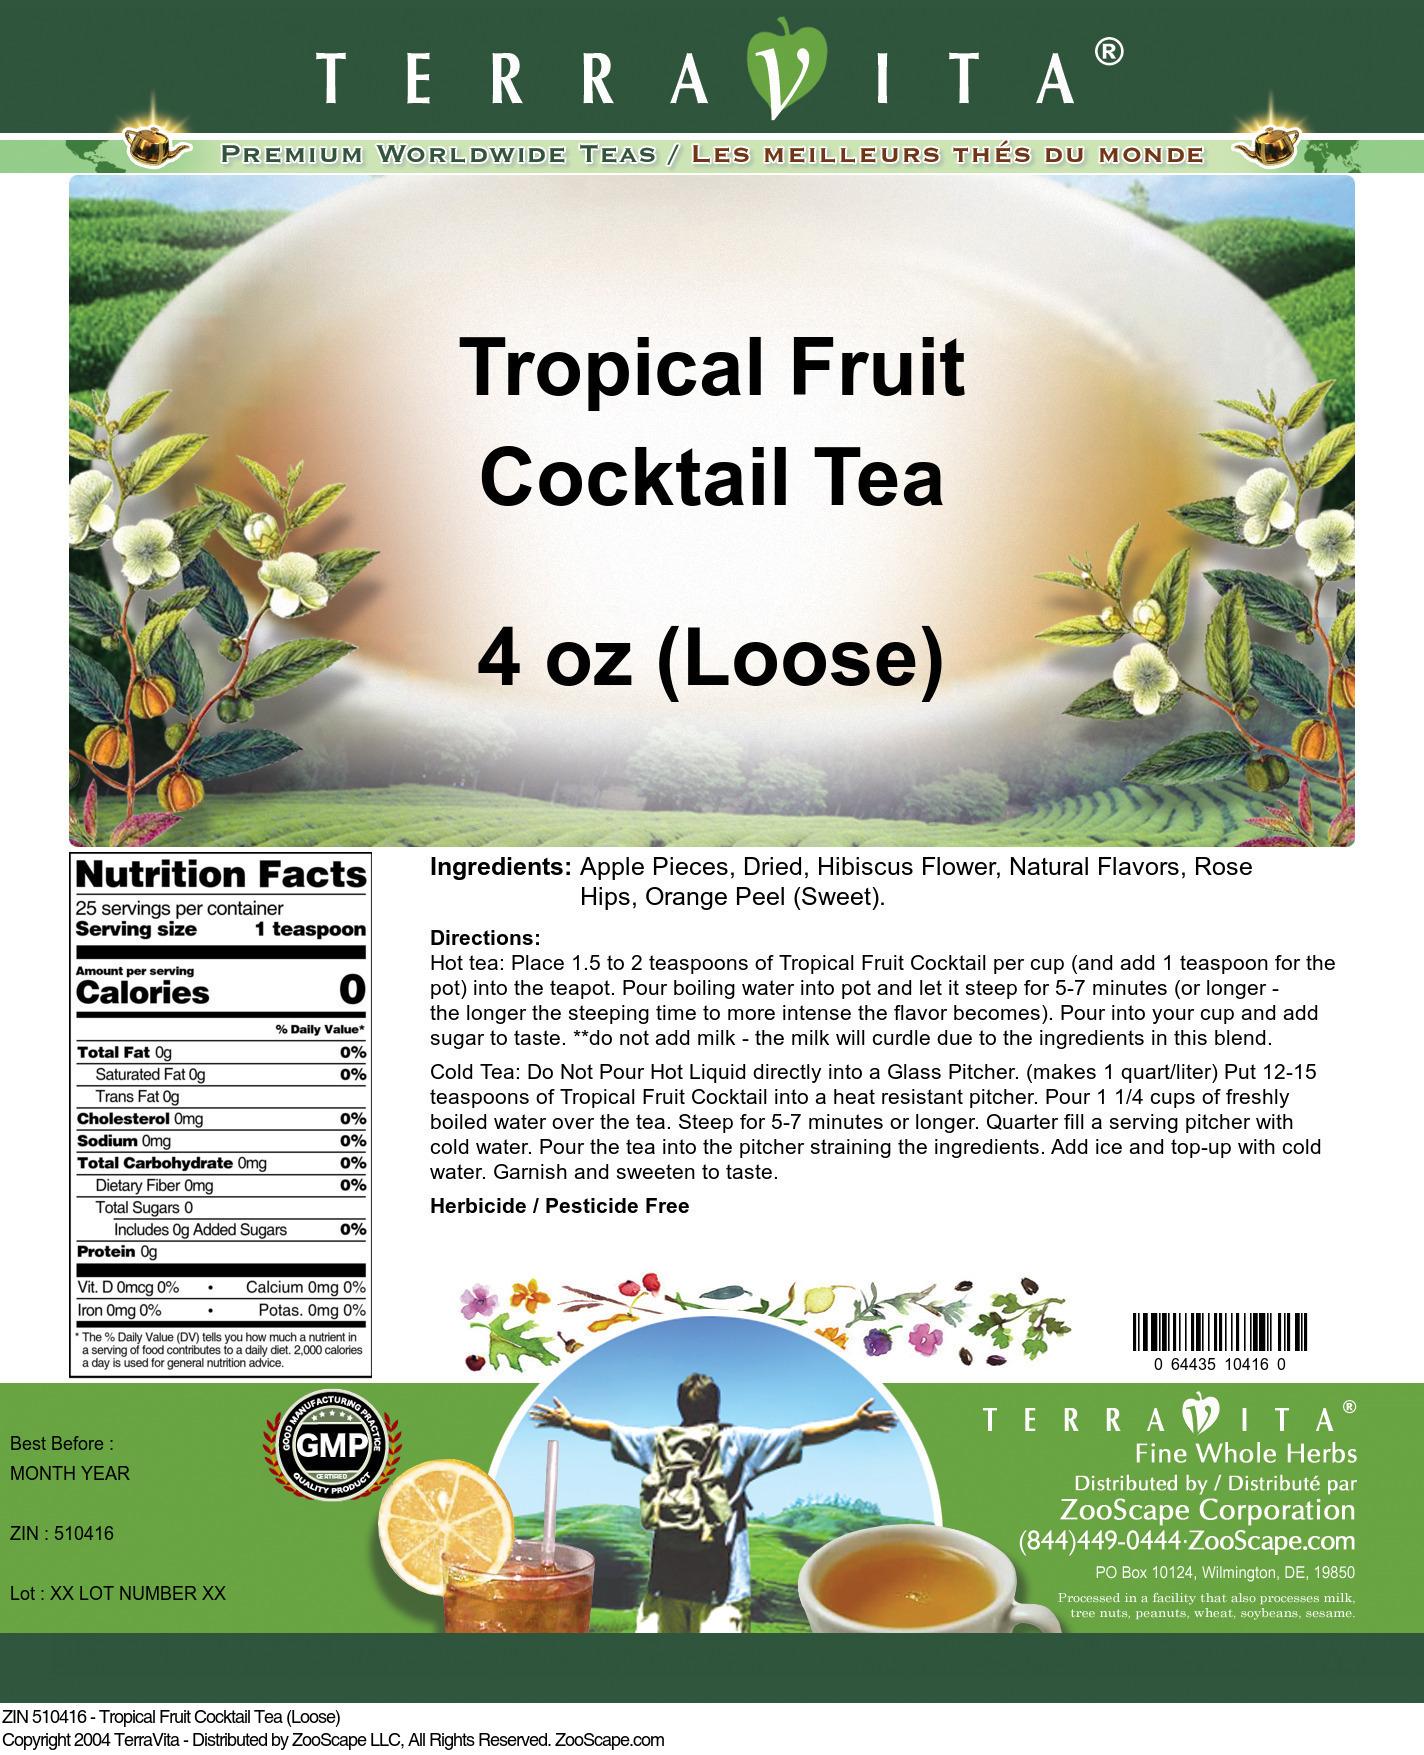 Tropical Fruit Cocktail Tea (Loose)